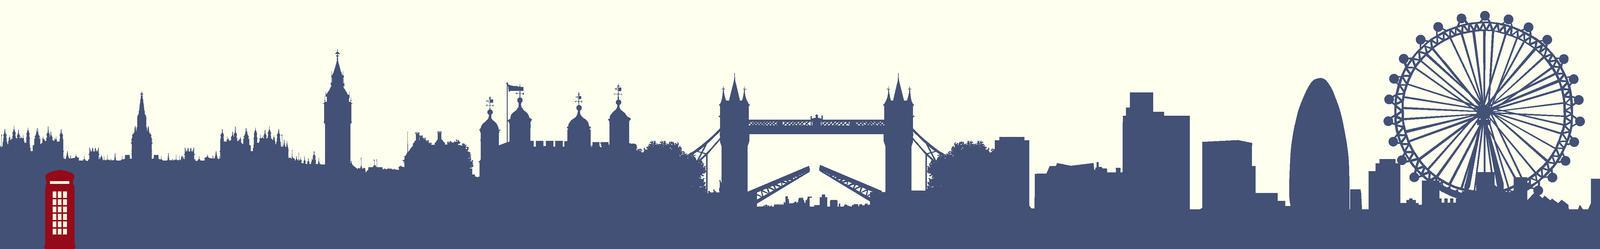 London Skyline By KyariTheKonverseKidd